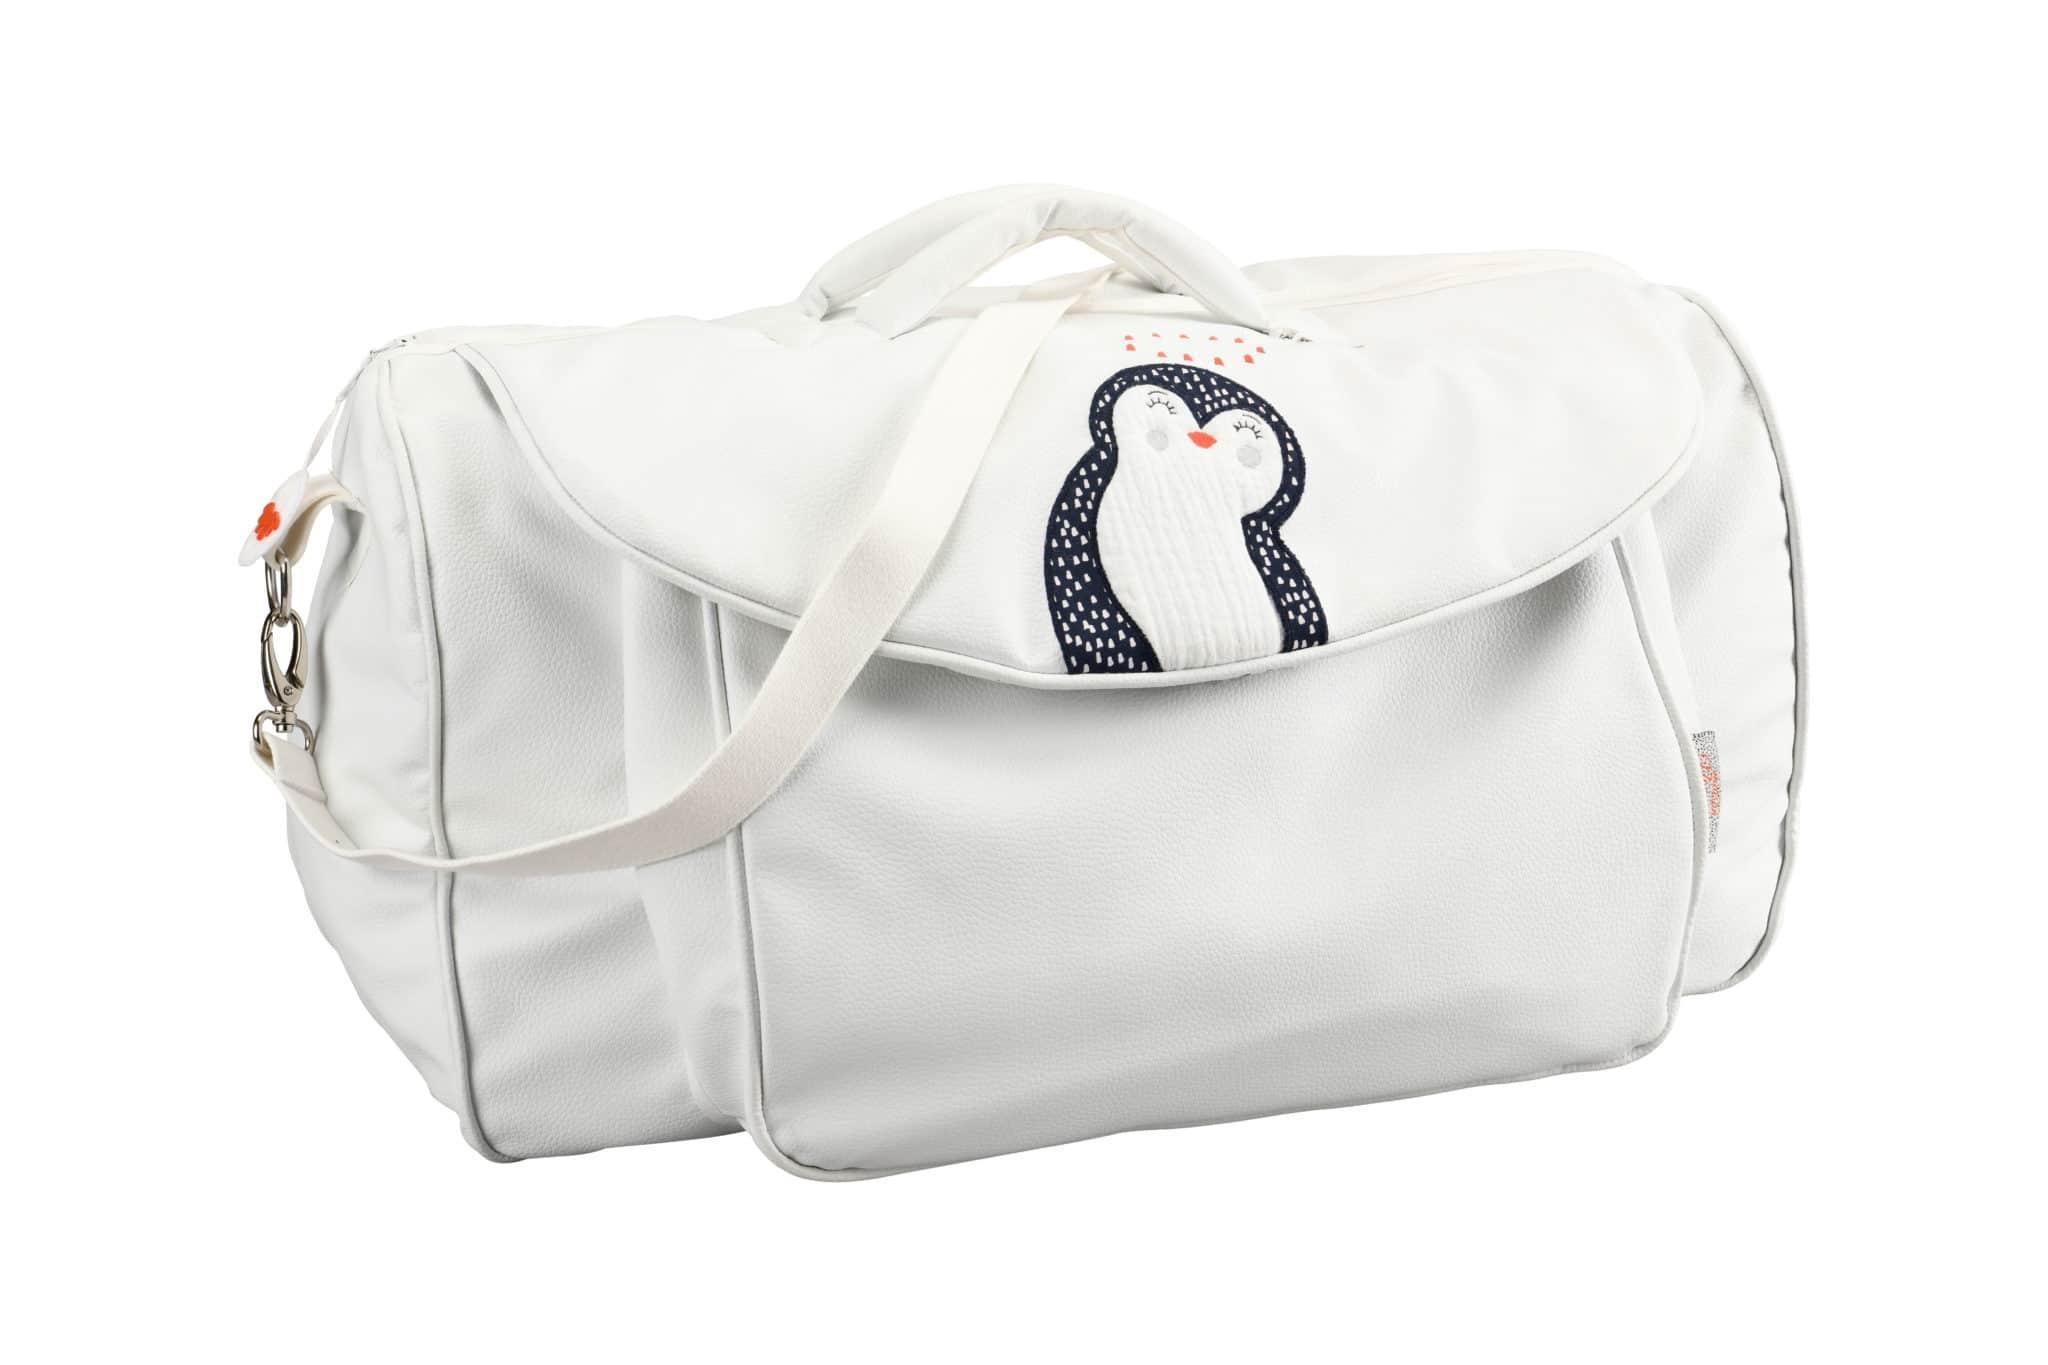 sac de voyage pingouin